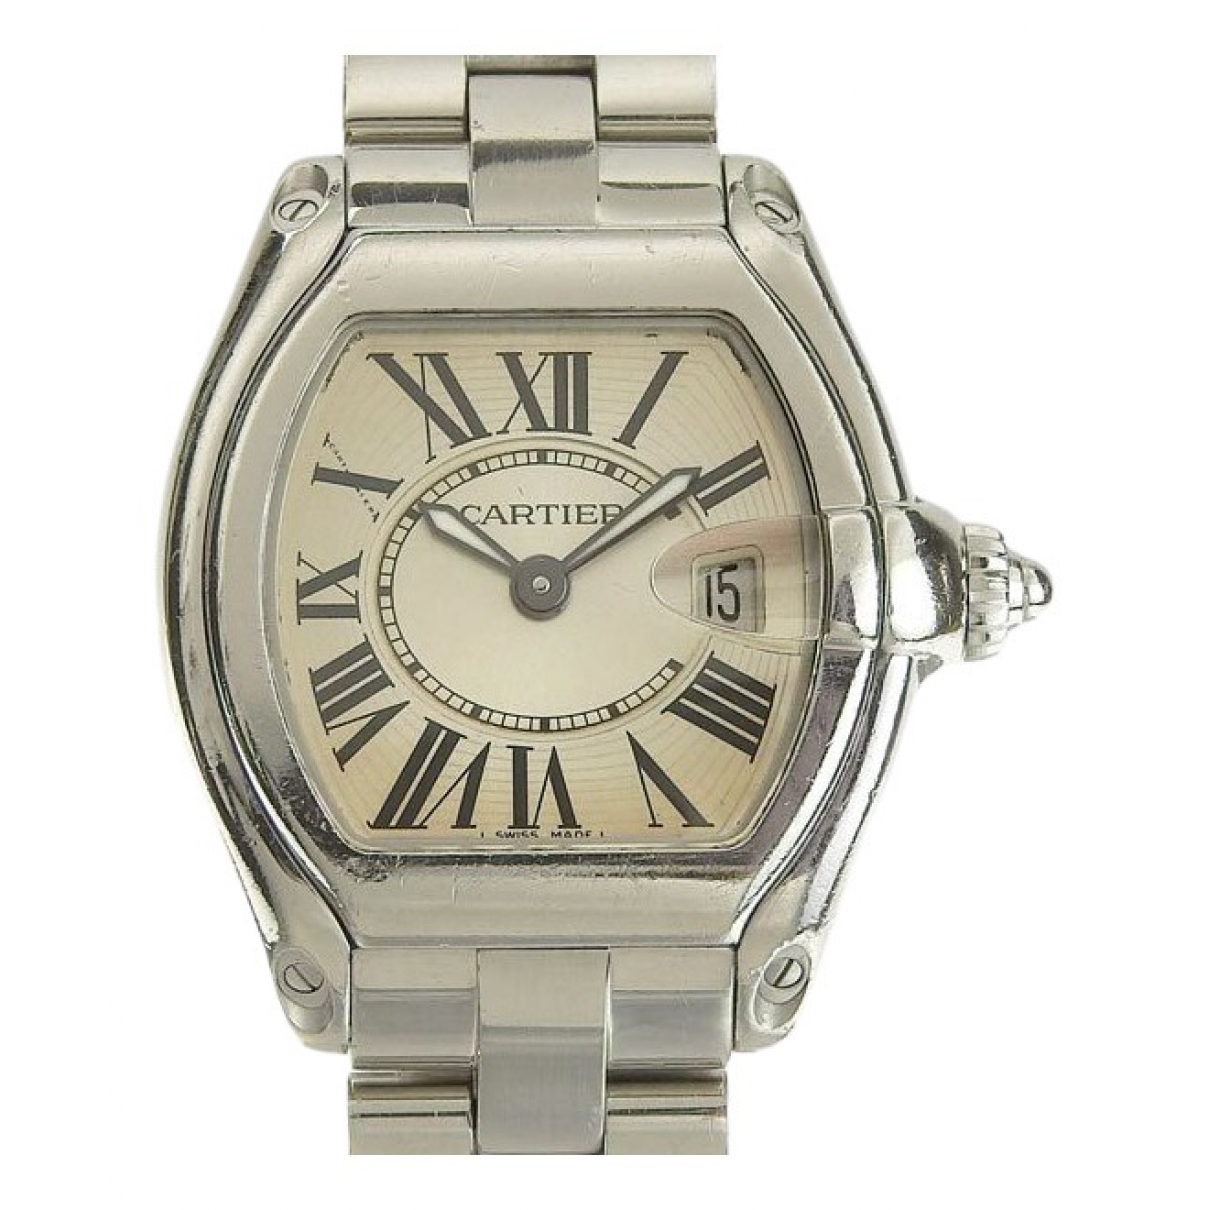 Cartier Roadster Uhr in  Silber Stahl